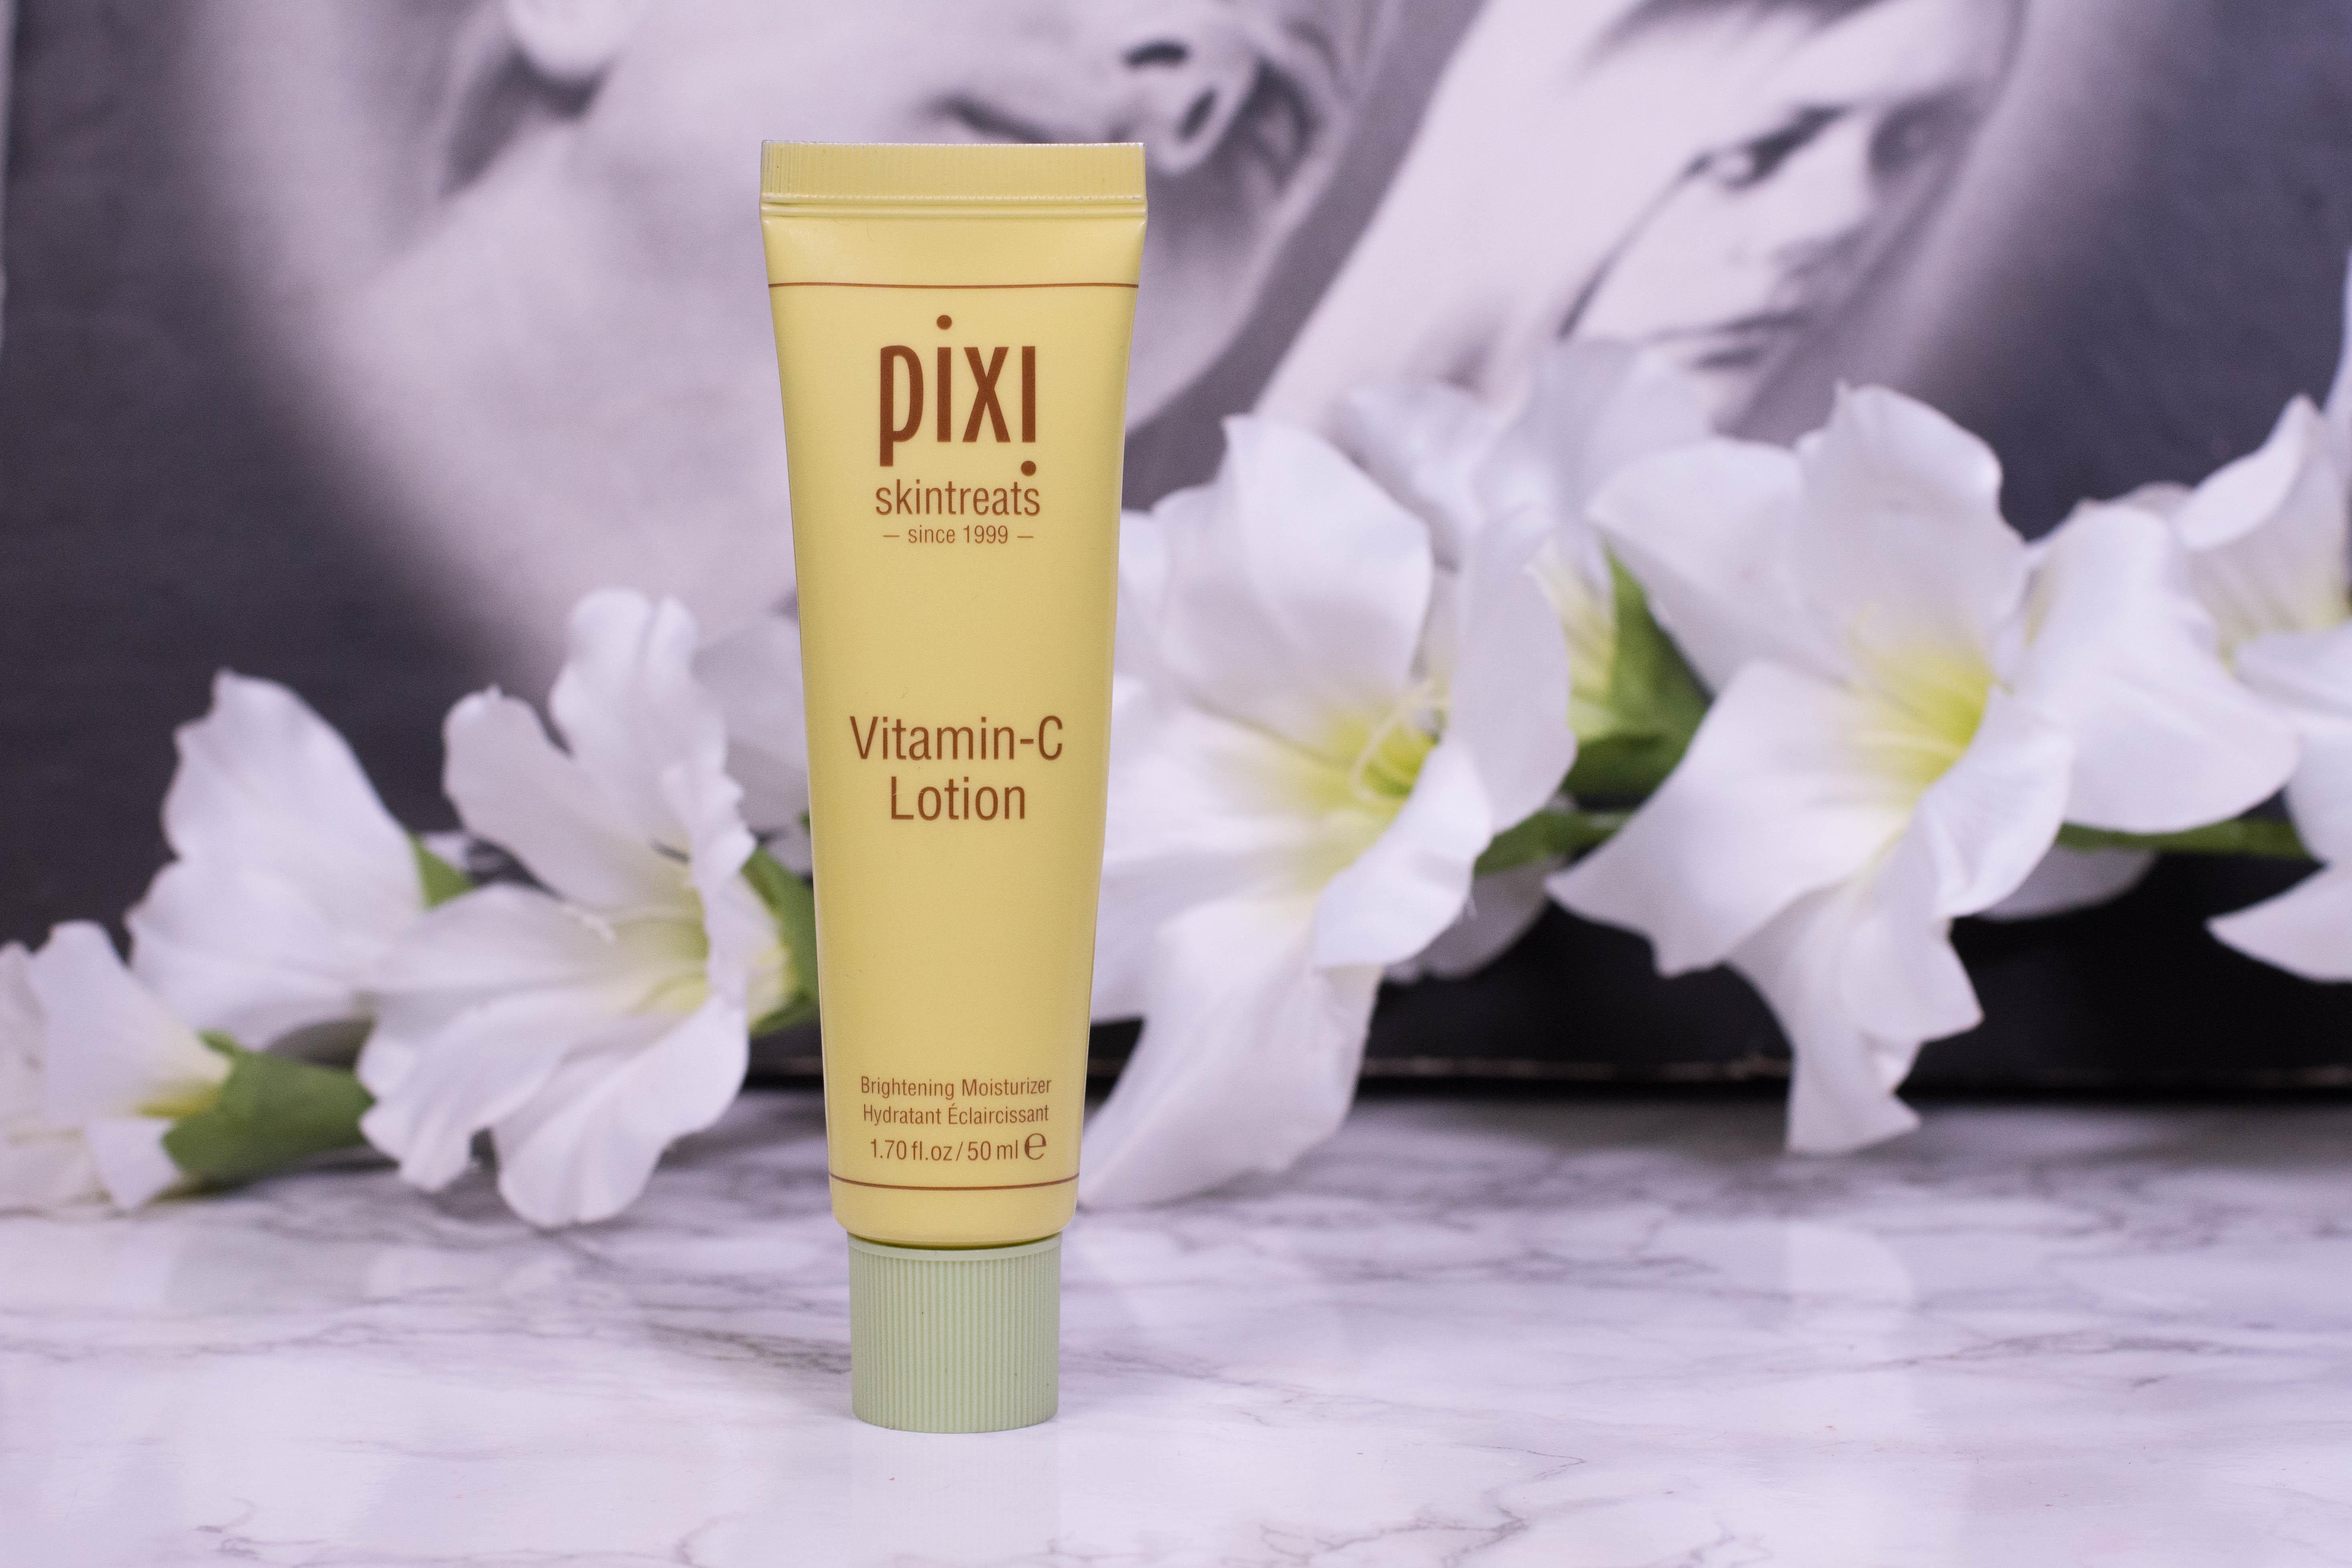 pixi skintreats Vitamin C Lotion